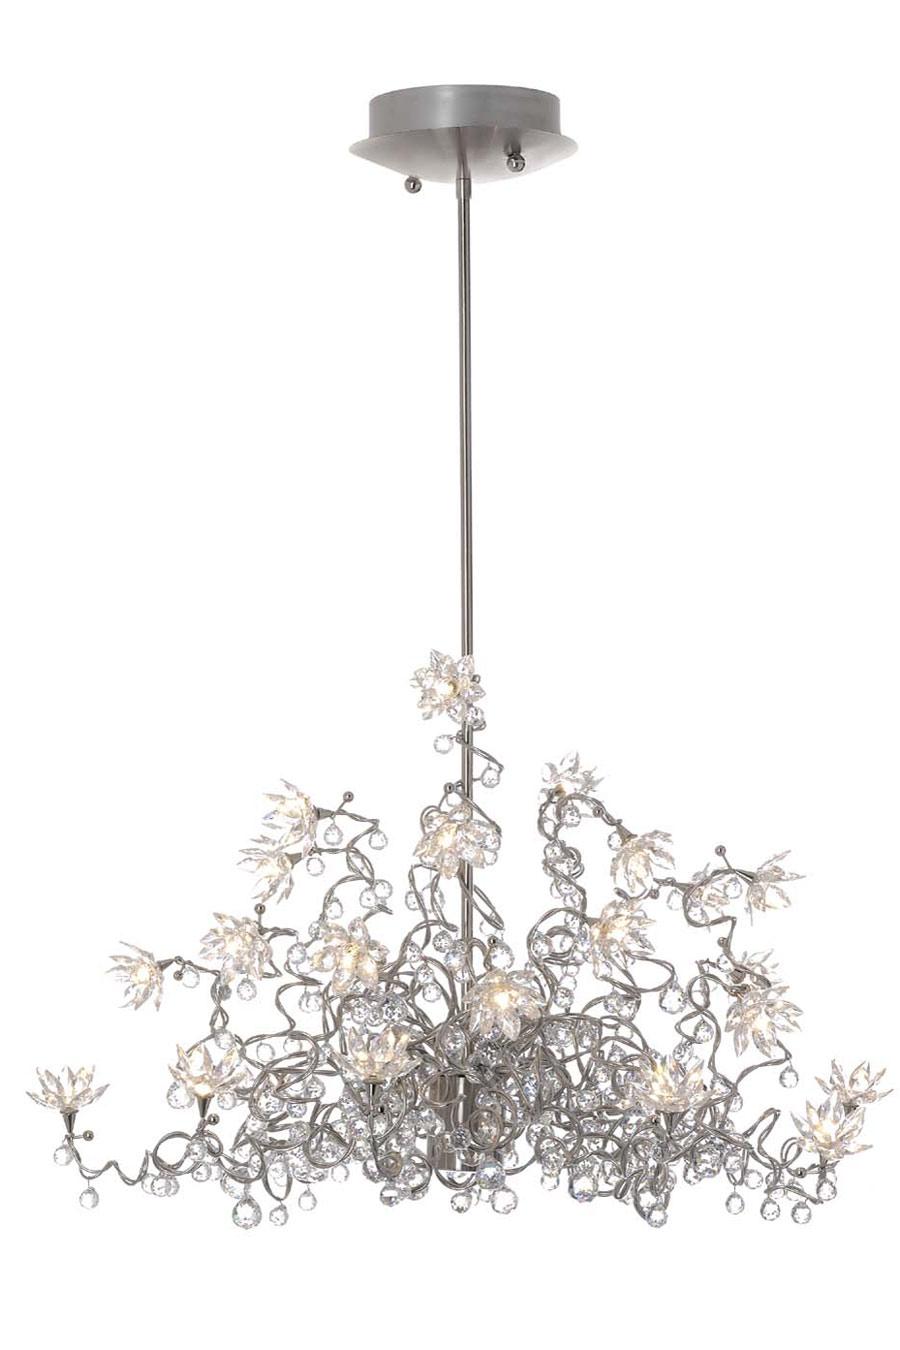 jewel diamond lustre transparent chandelier 24 lumi res en verre transparent harco loor. Black Bedroom Furniture Sets. Home Design Ideas